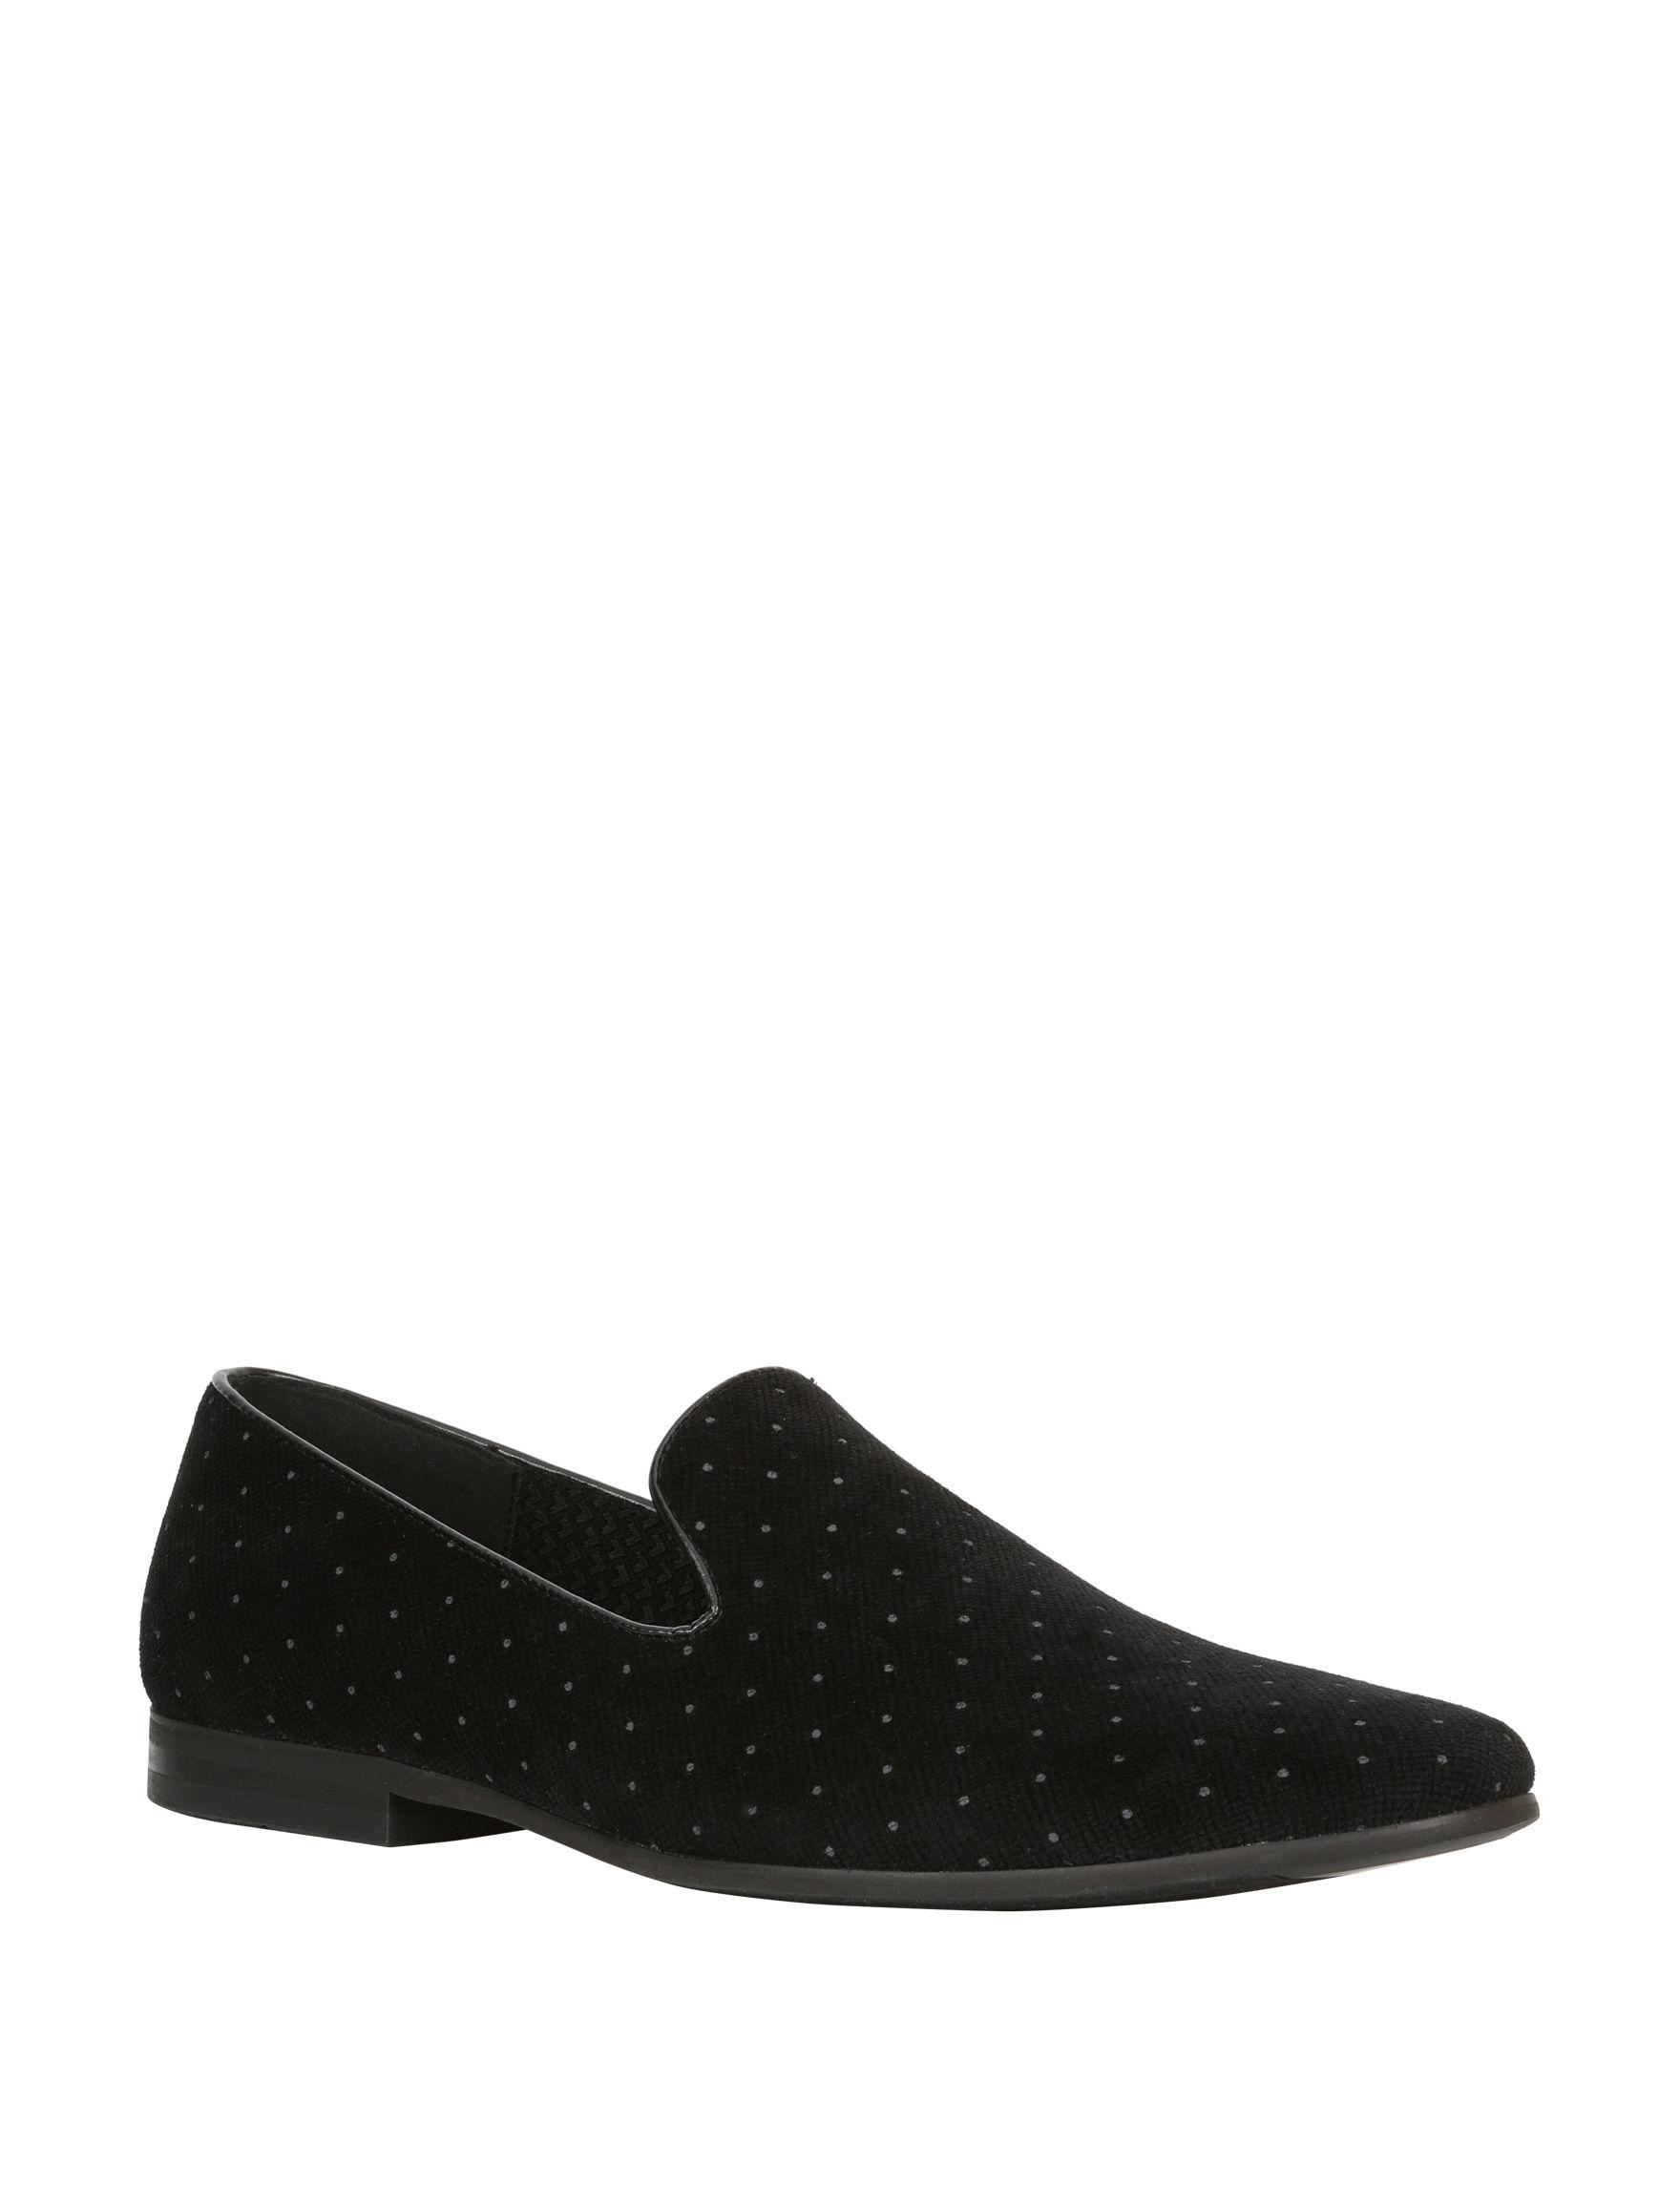 Giorgio Brutini Black Slipper Sandals